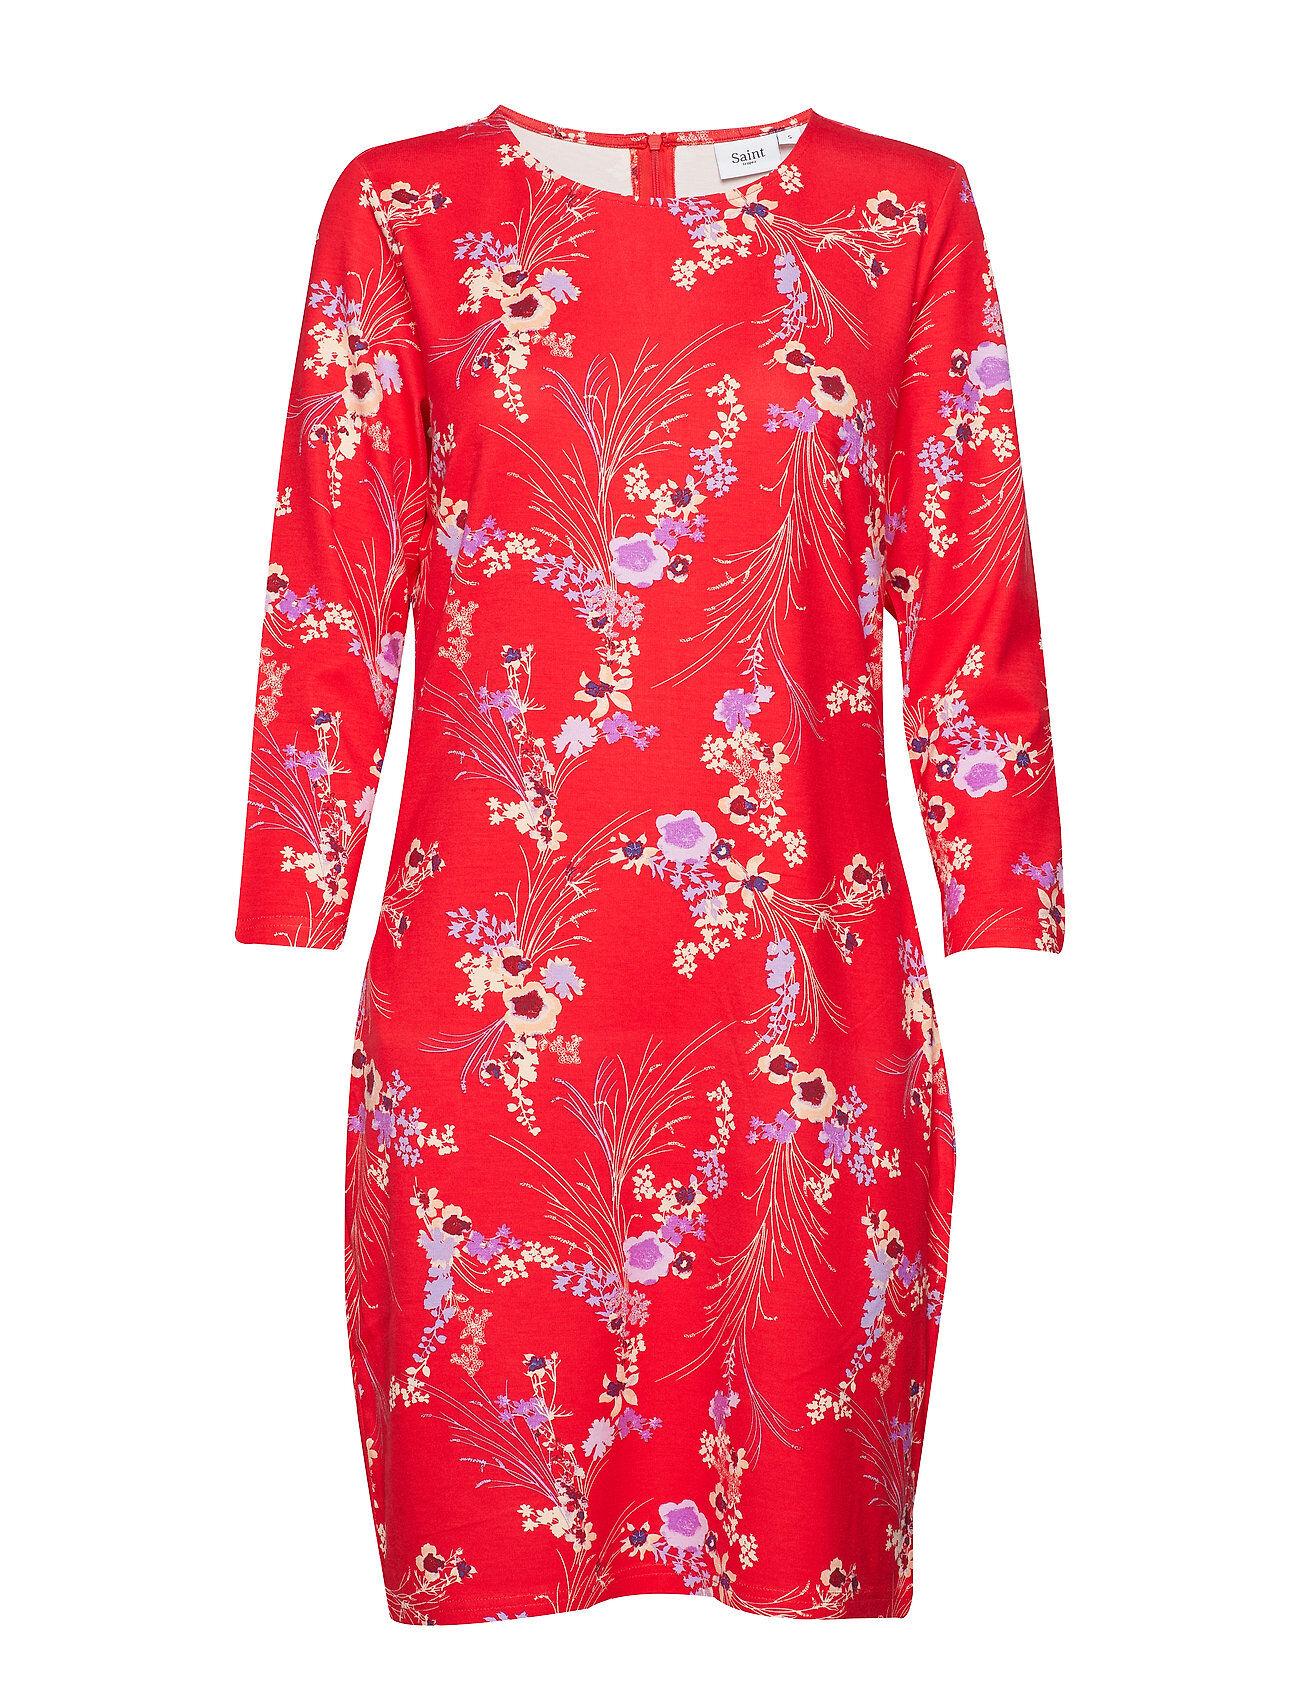 Saint Tropez Red Love P Jersey Dress Polvipituinen Mekko Punainen Saint Tropez